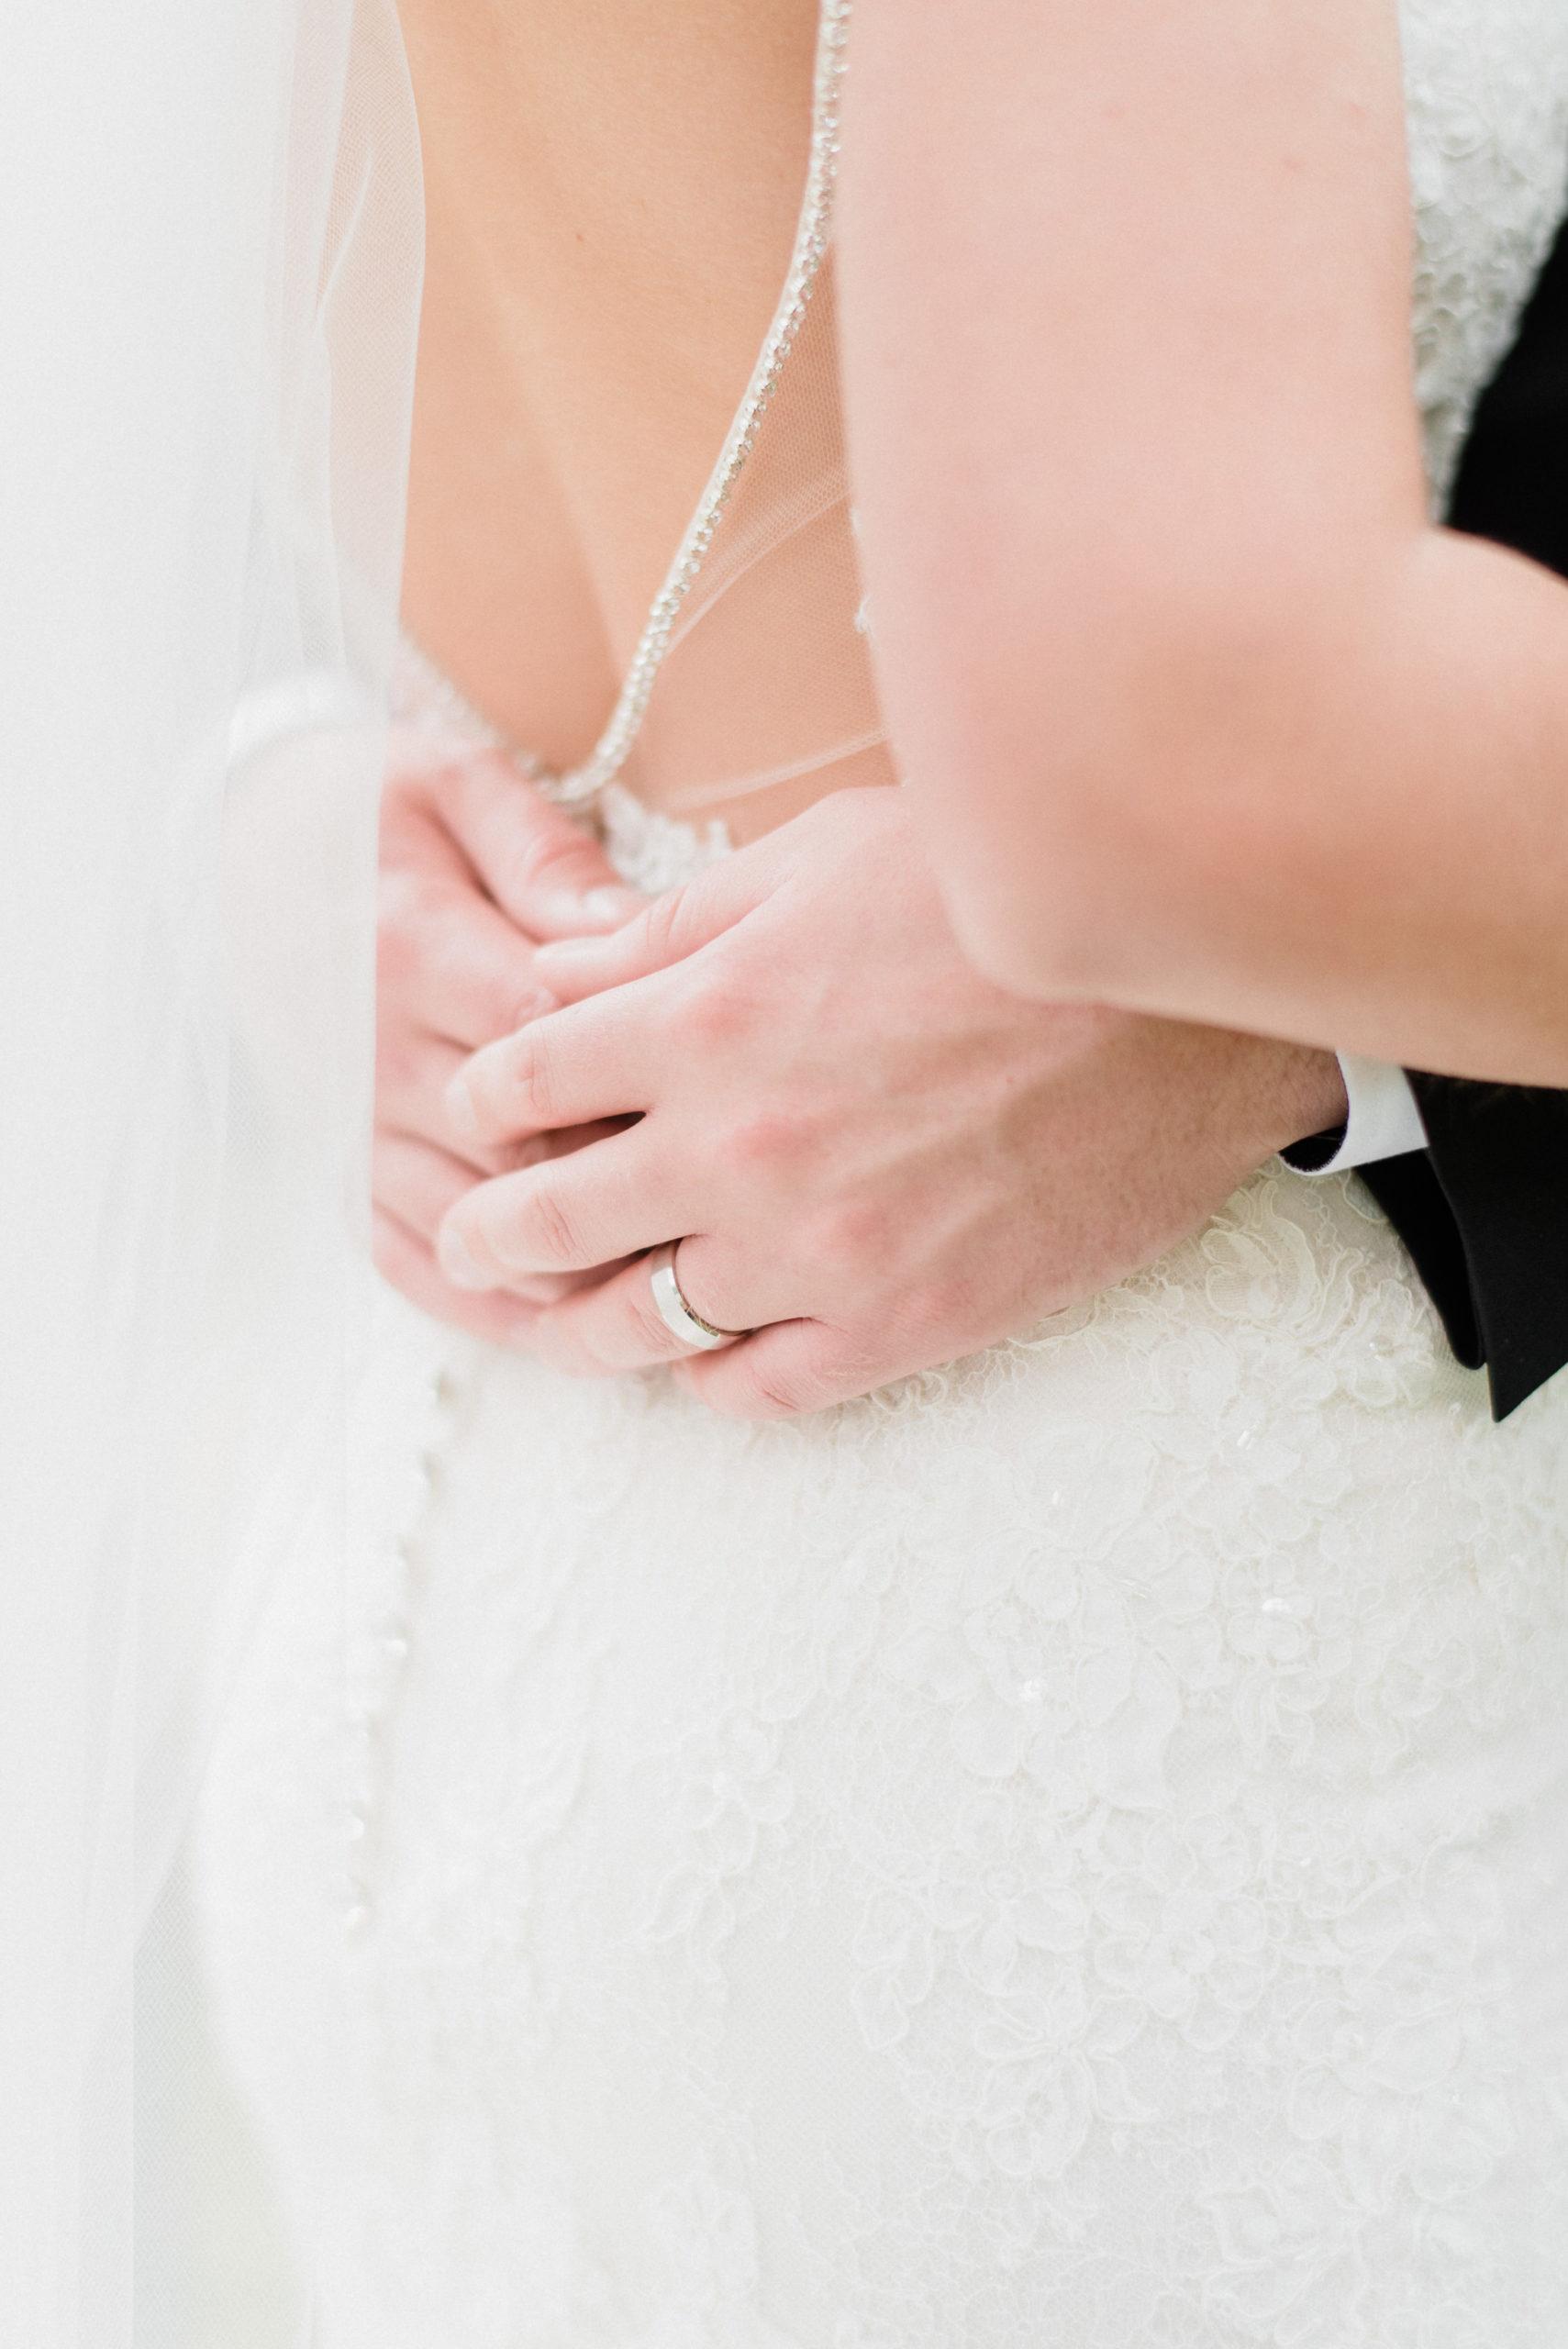 Newlywed-Wedding-Bands